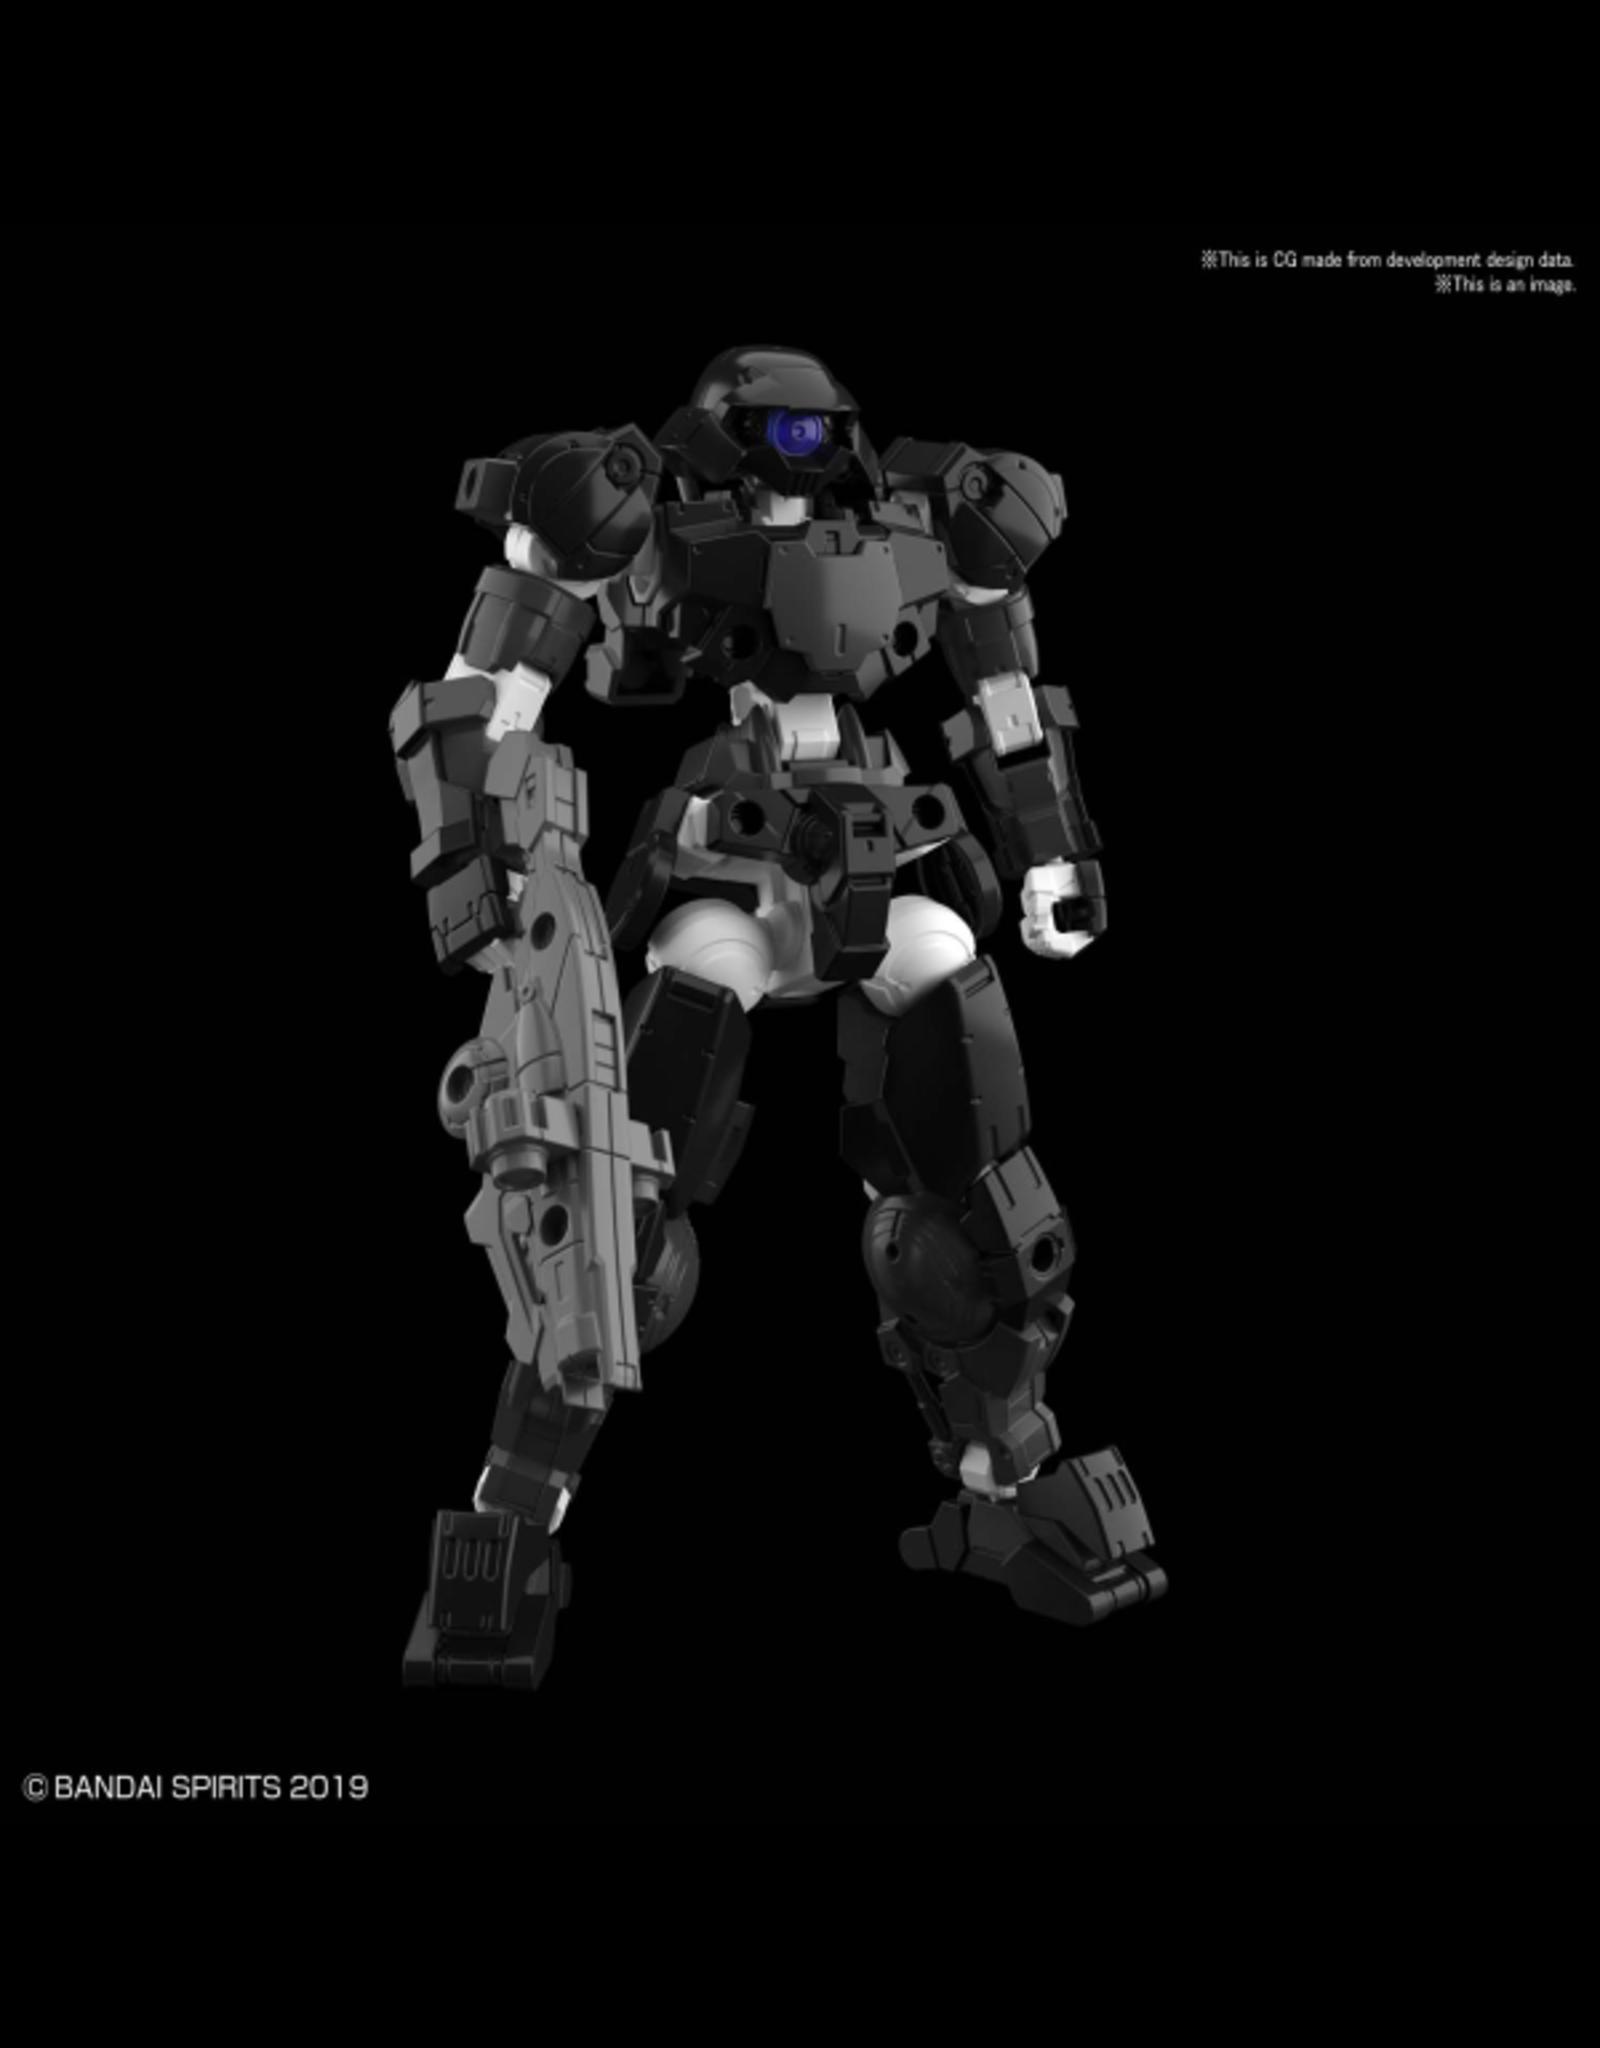 BANDAI 30MM 1/144 bEXM-15 PORTANOVA [BLACK]